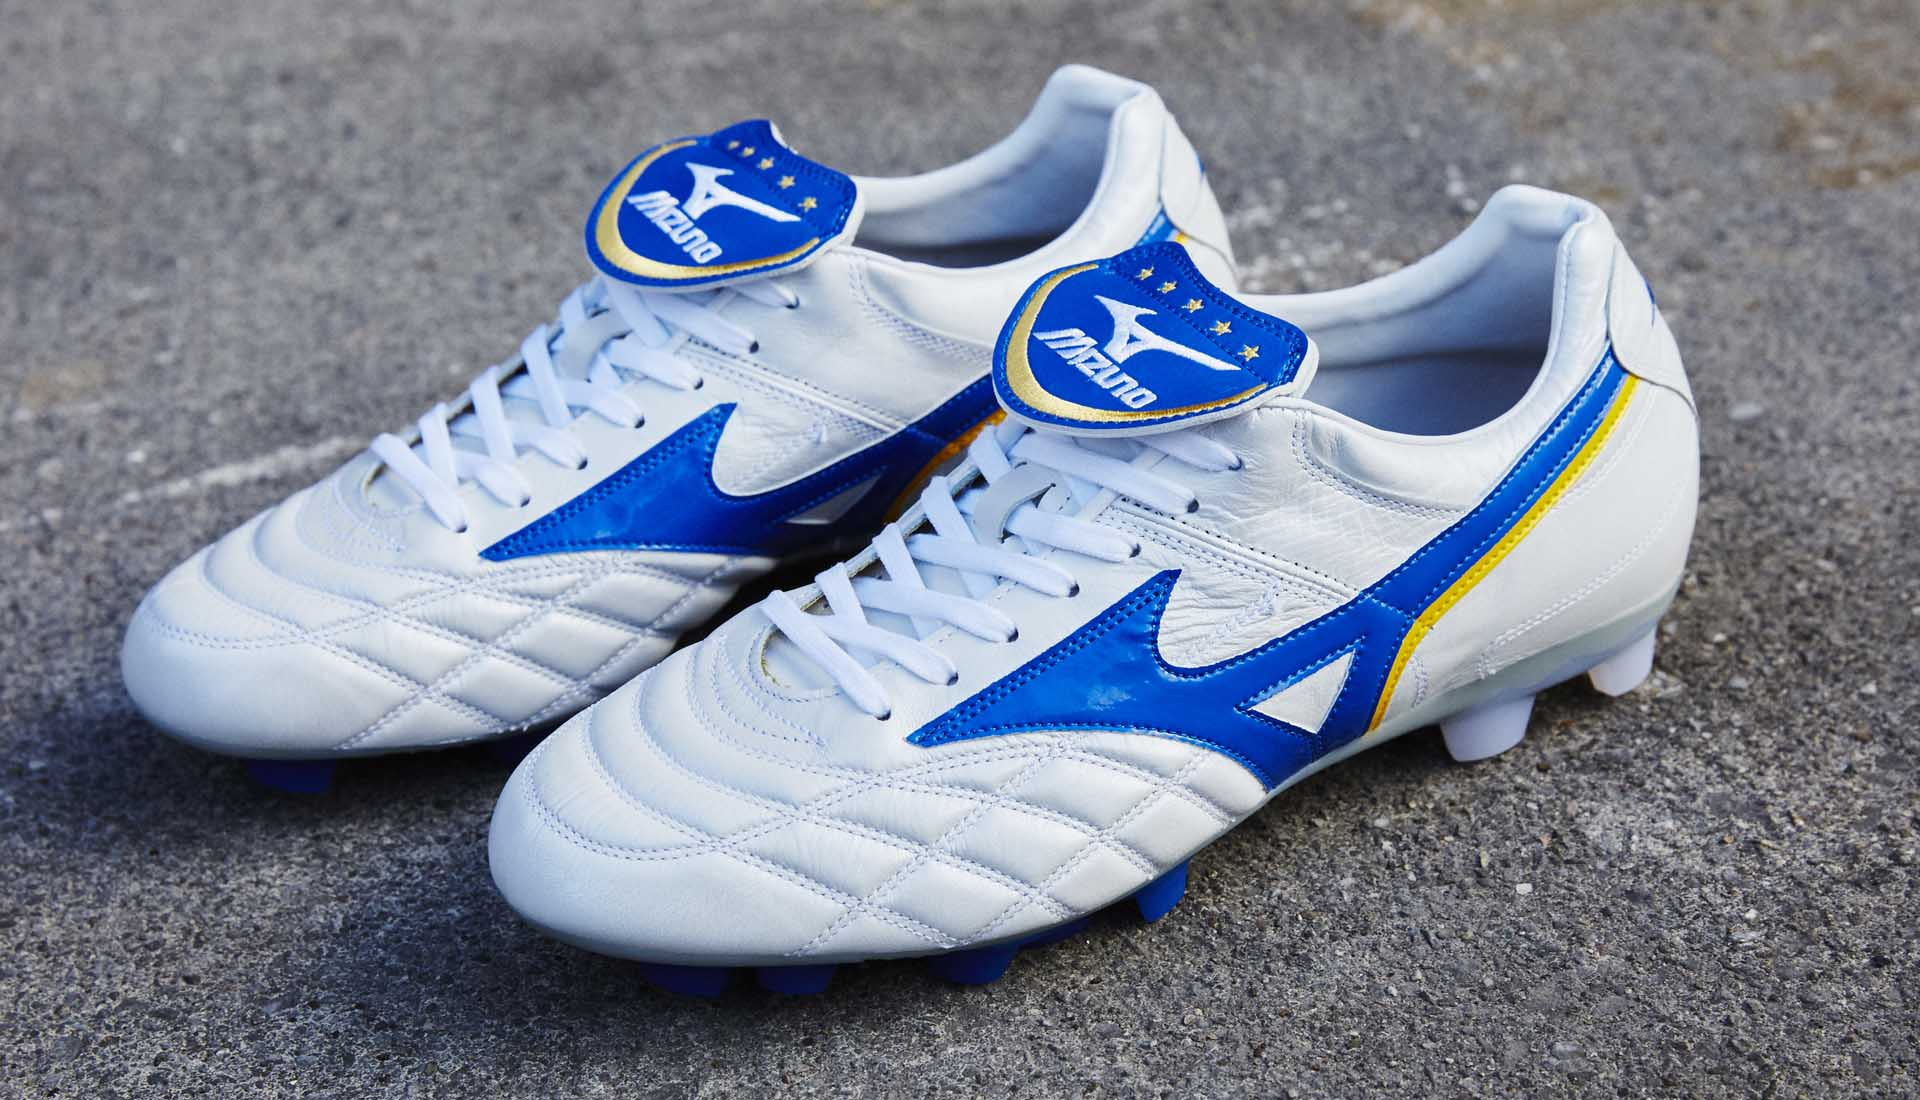 mizuno soccer shoes turf uruguayo 360